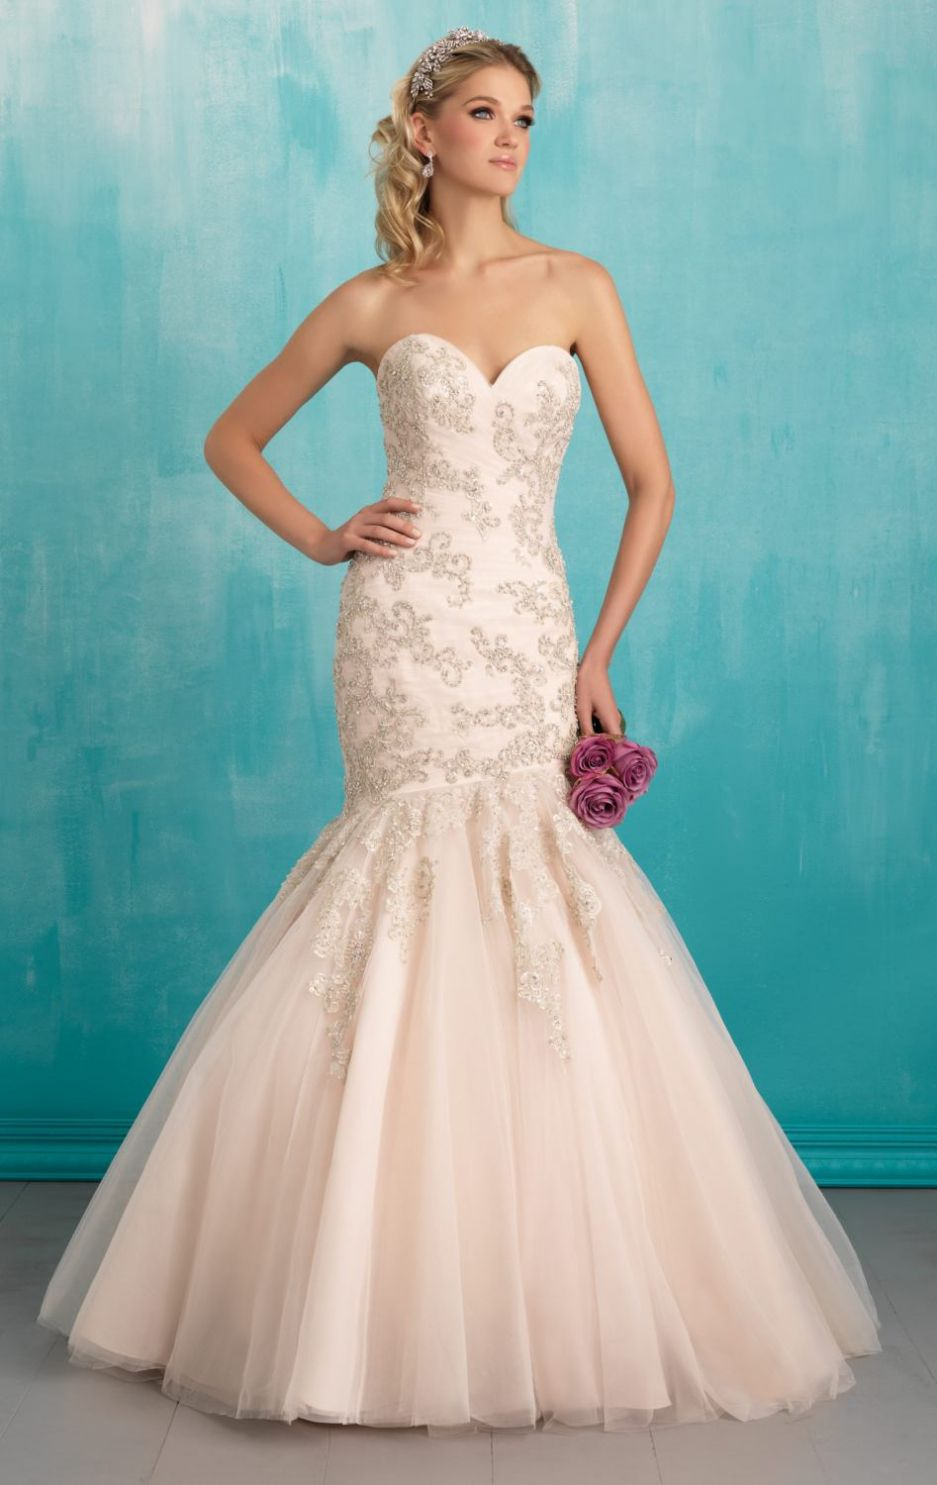 Wedding Dresses, Wedding Dress, Long Dresses, Mermaid Wedding ...